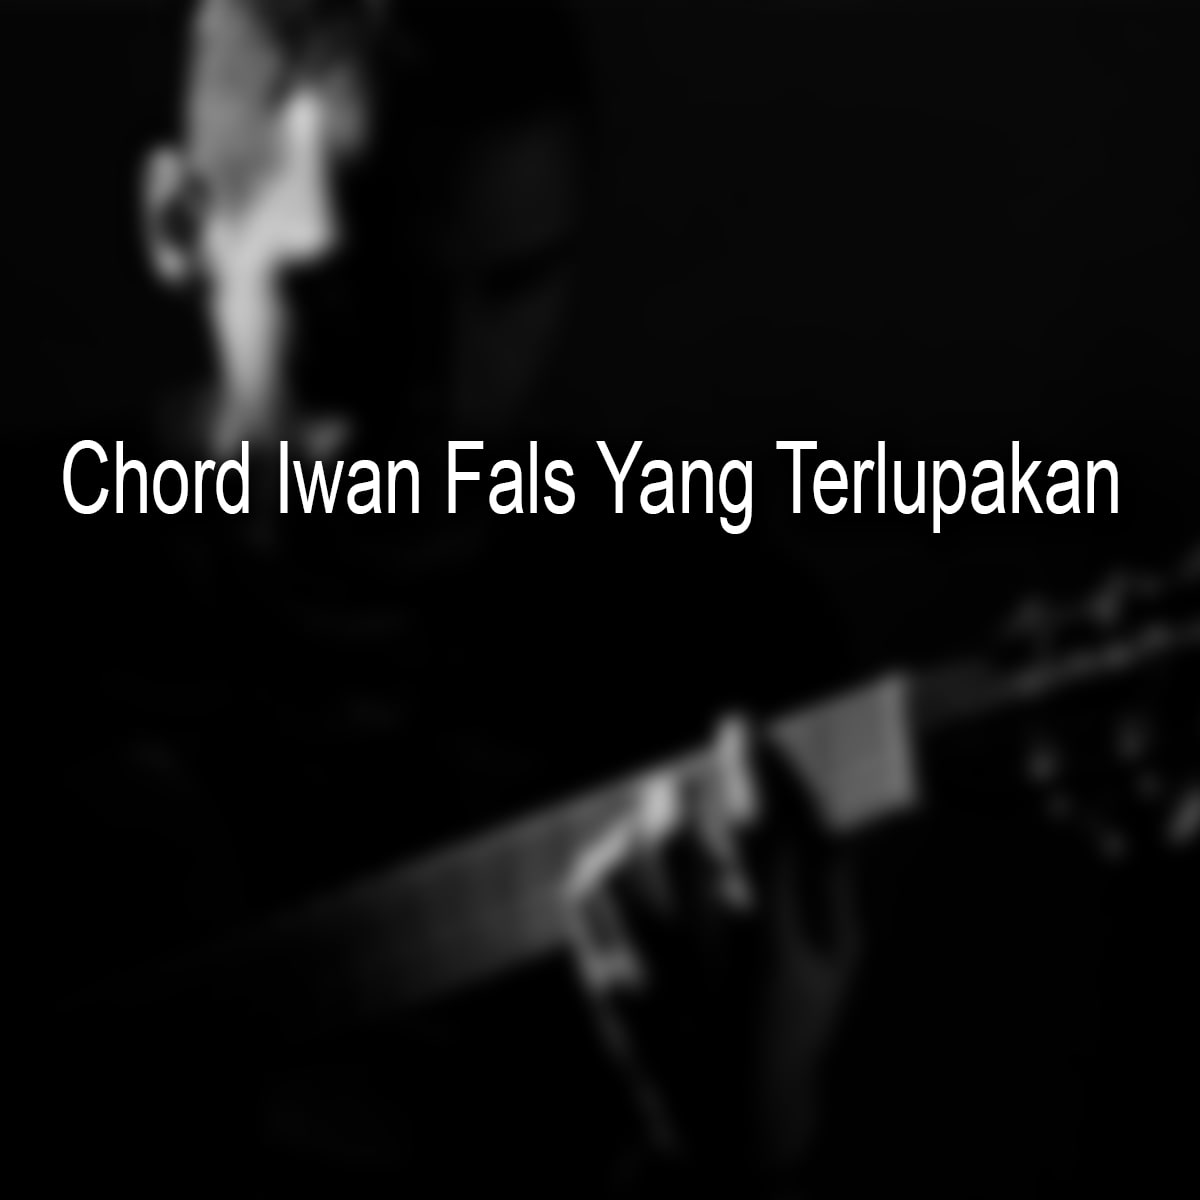 Chord Iwan Fals Yang Terlupakan